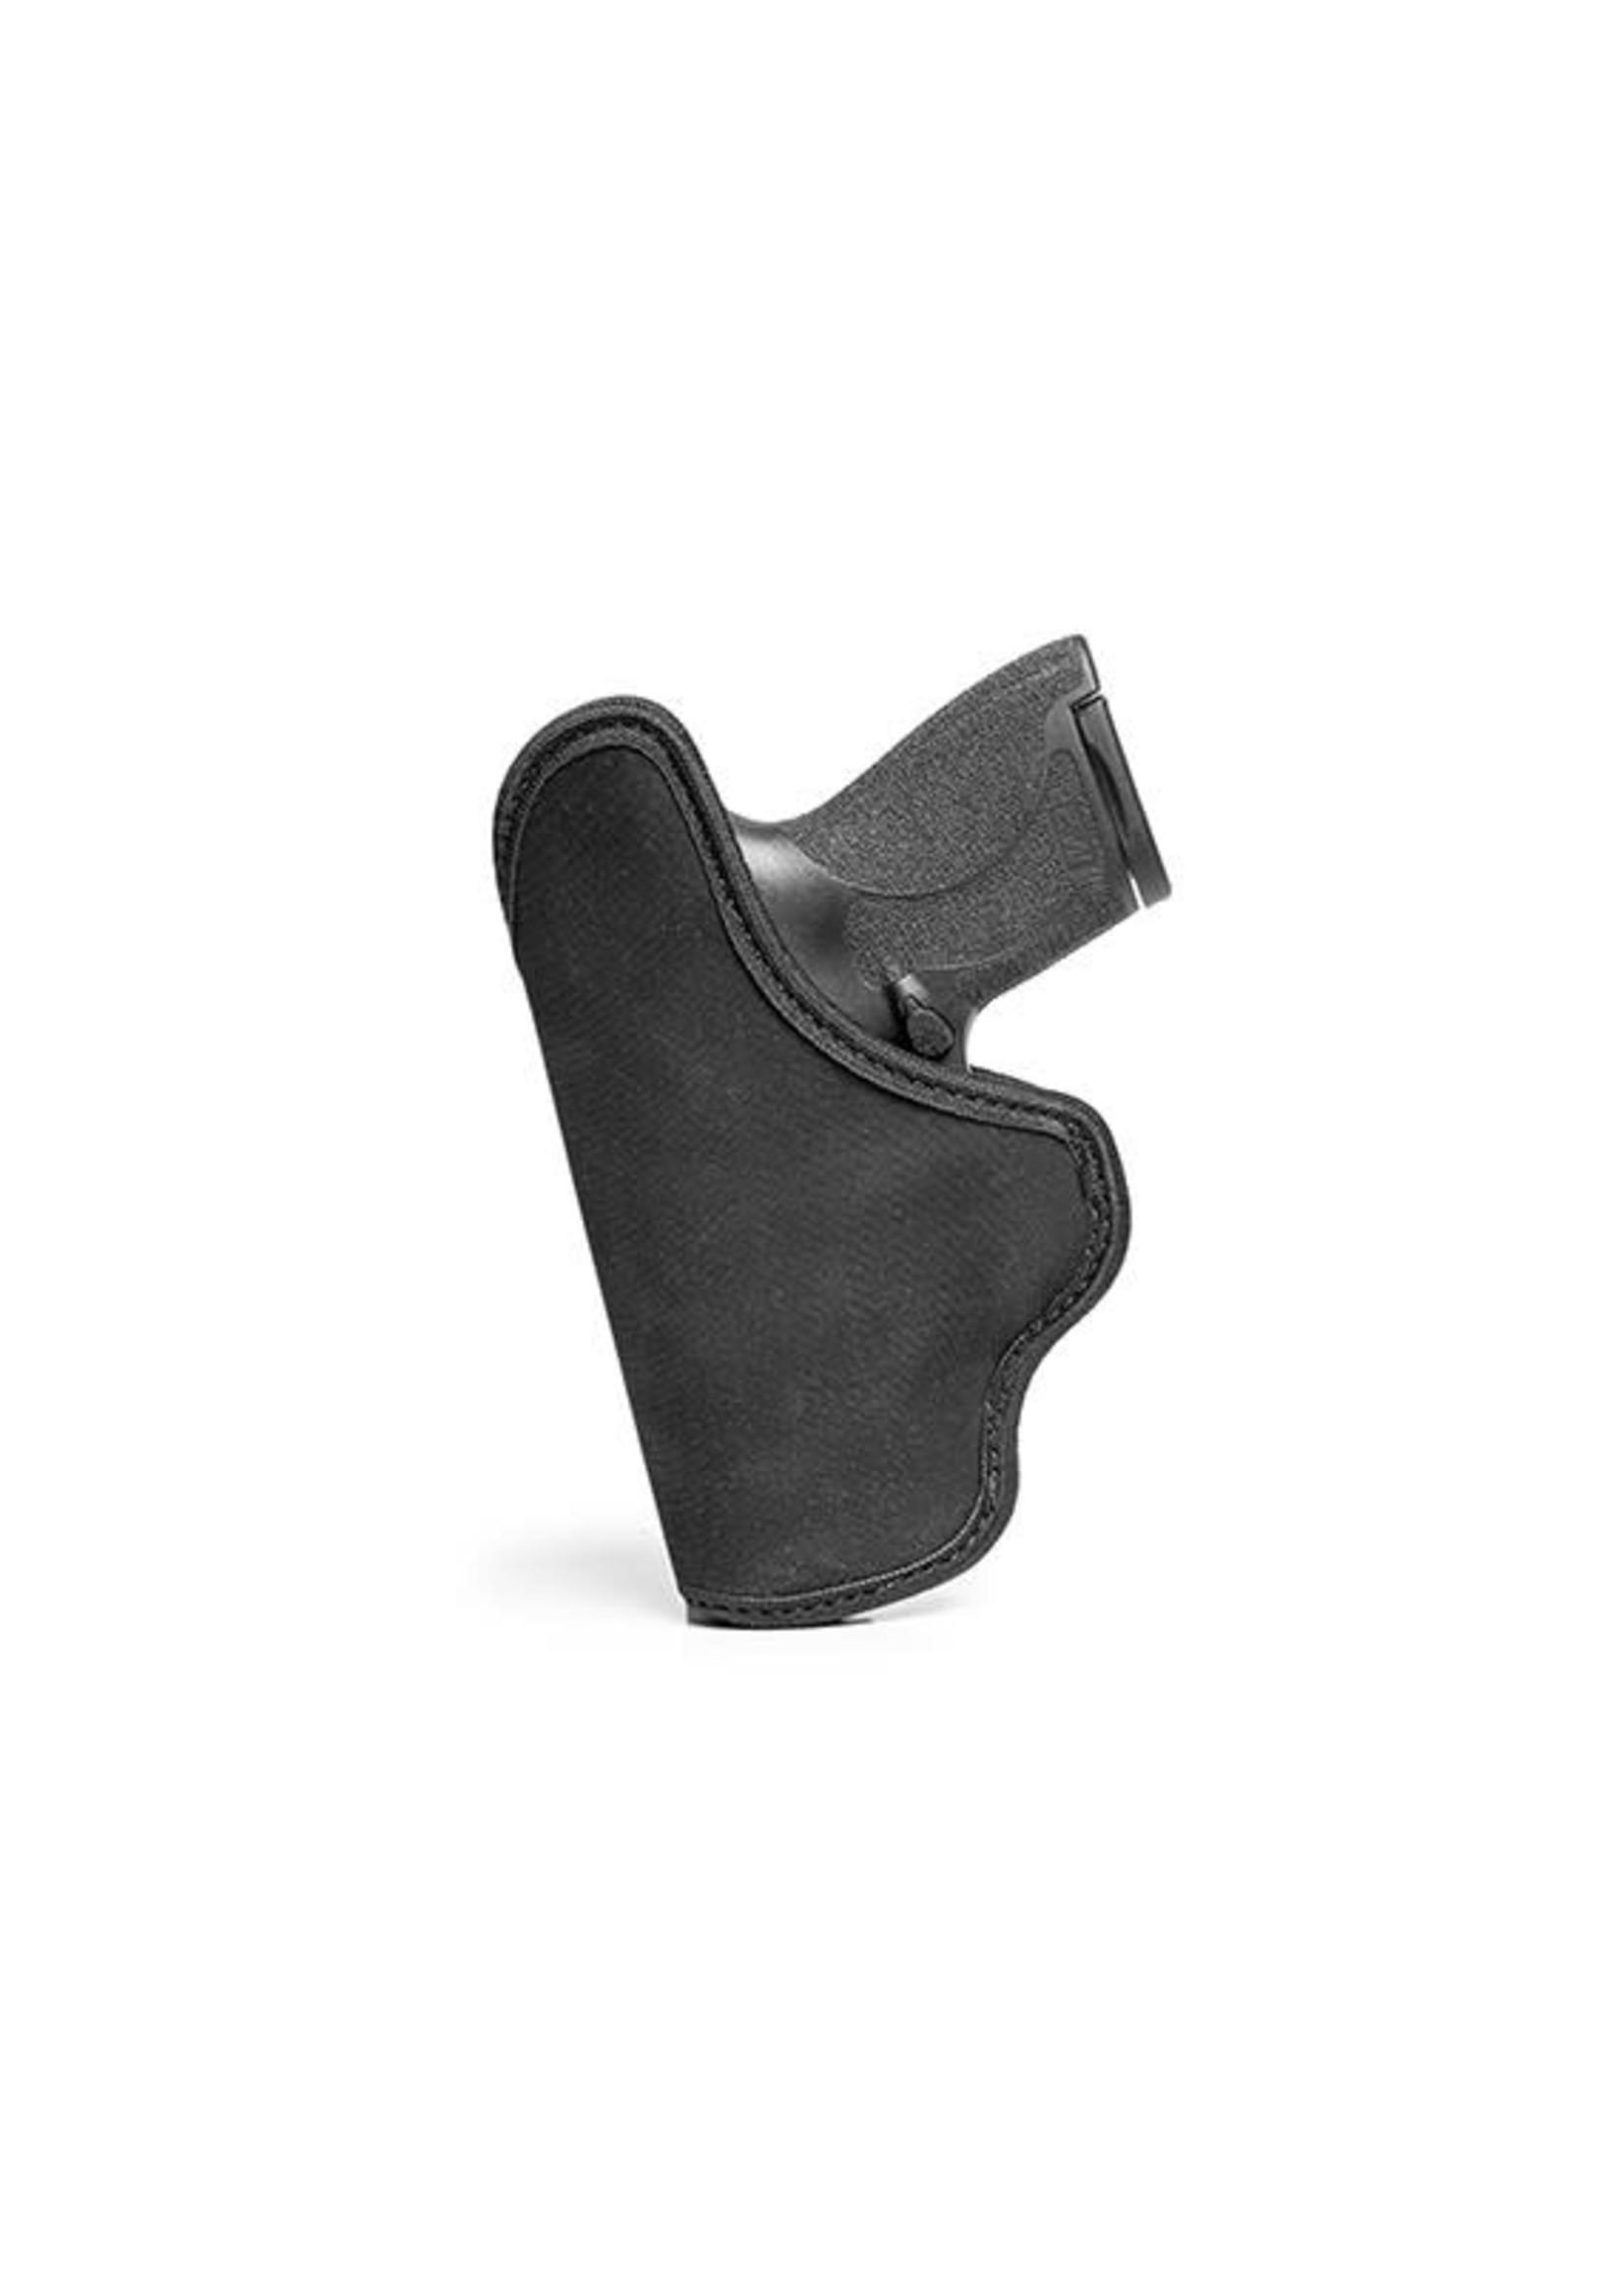 Alien Gear Holsters Alien Gear Grip Tuck Universal Holster - Subcompact, LH, Single Stack